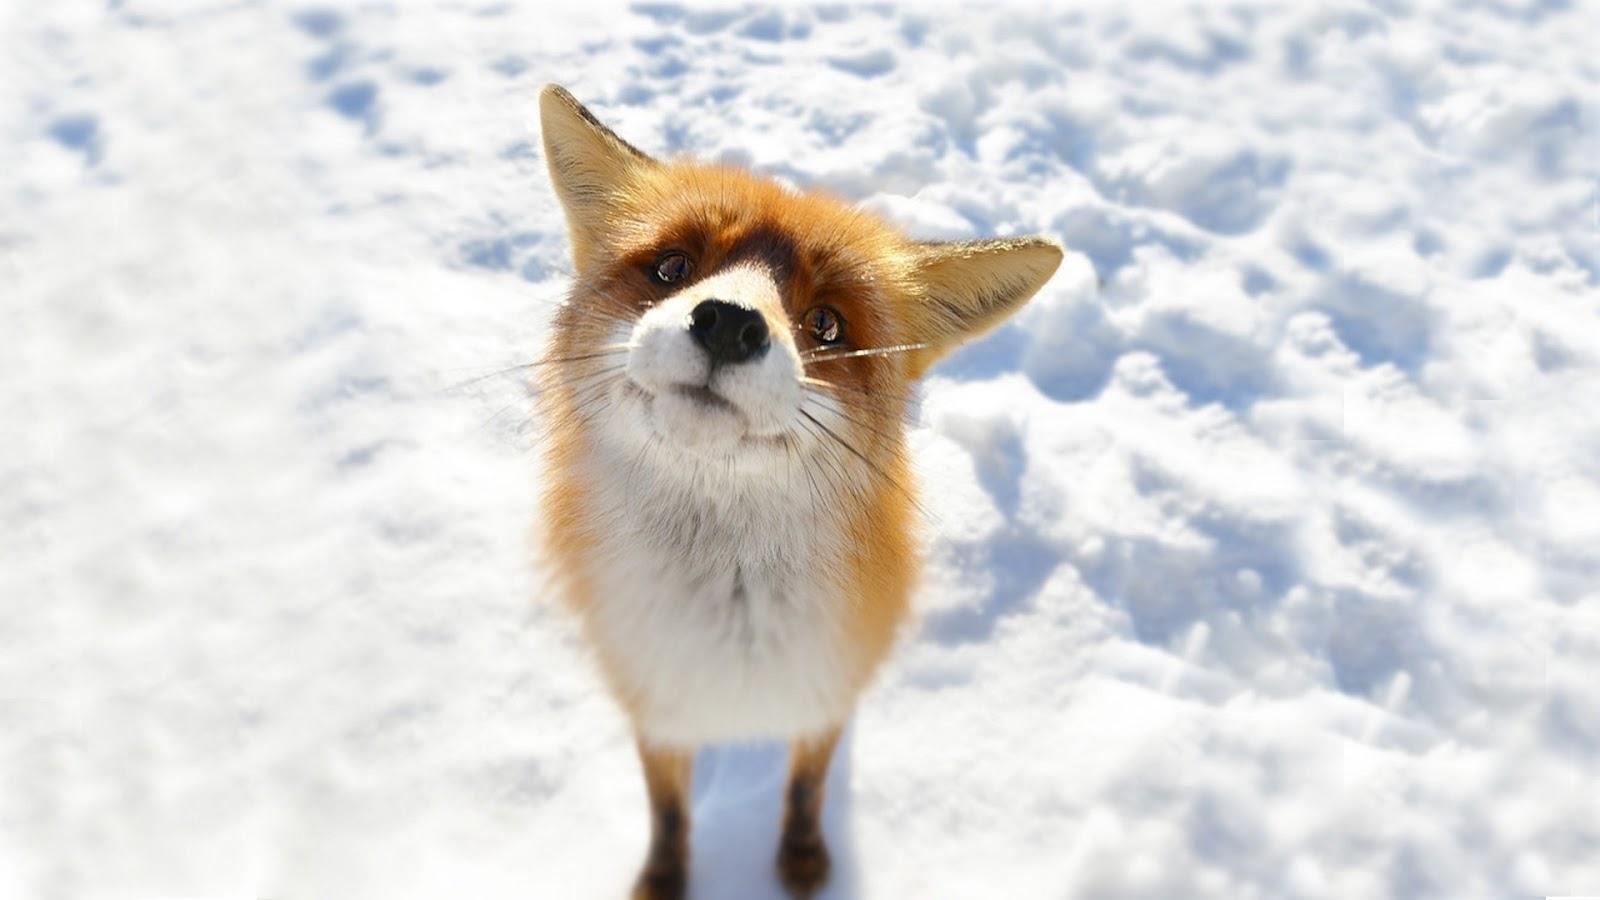 Curios fox on white snow